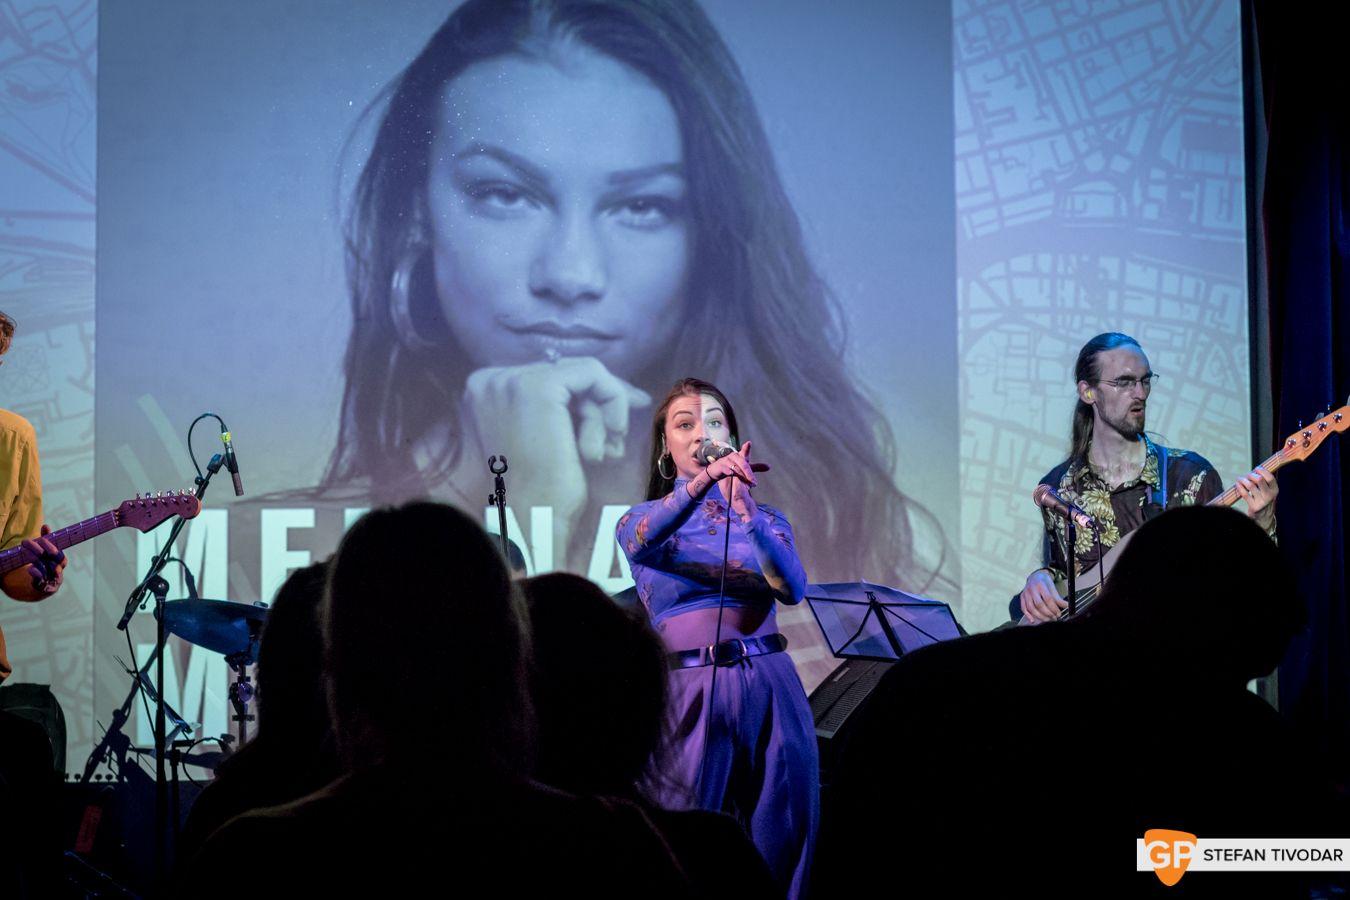 Melina Malone GoldenPlec Bloc Party Jam 2018 Sugar Club 1